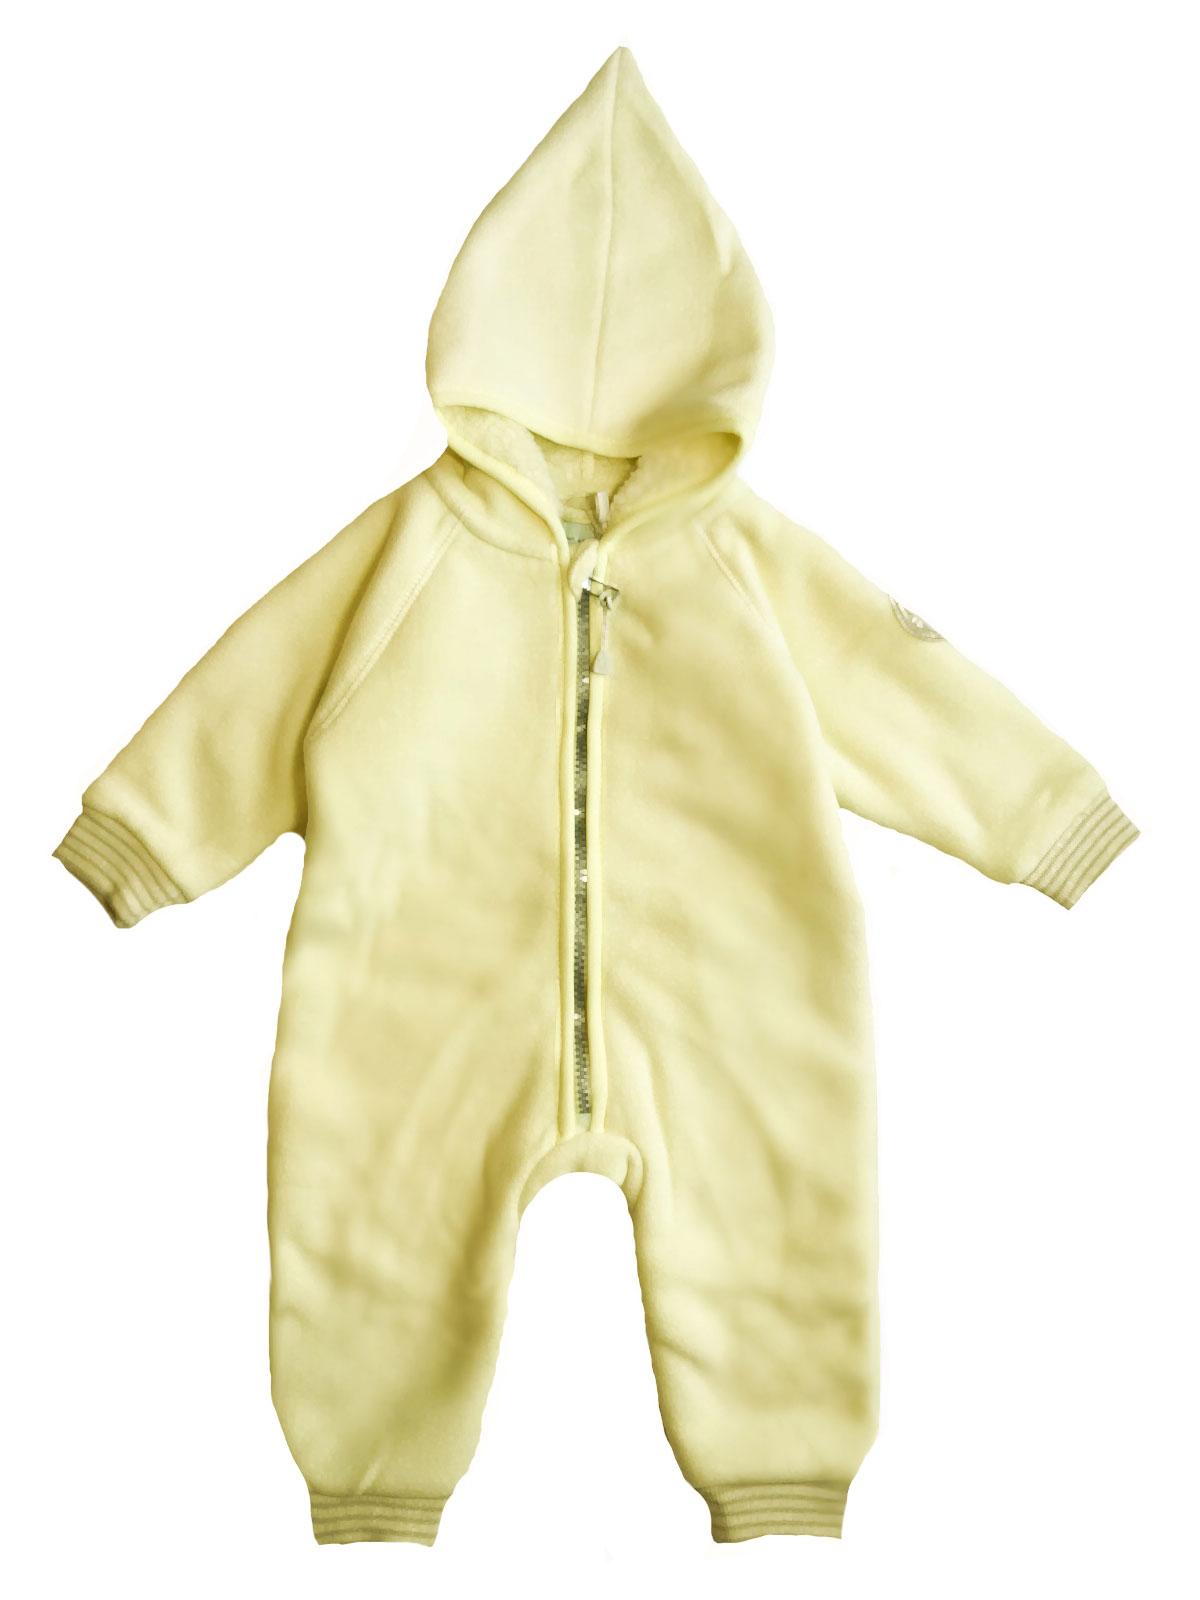 0b7aa8c6188 Top Mini A Ture Adel fleecedress til baby, deep green - DressMyKid AS EW57